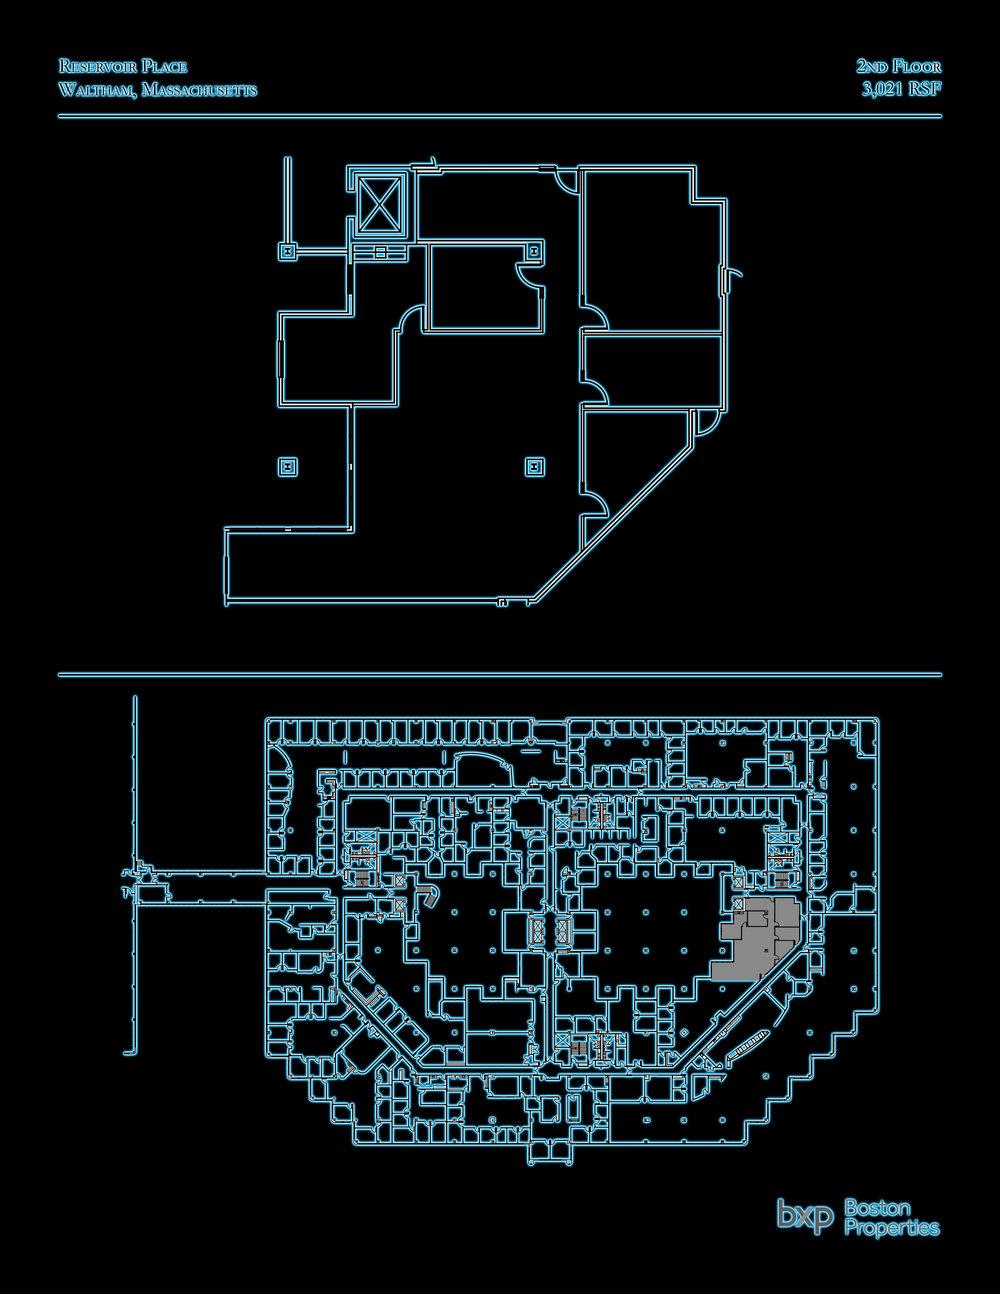 Reservoir Place - 3,021 SF